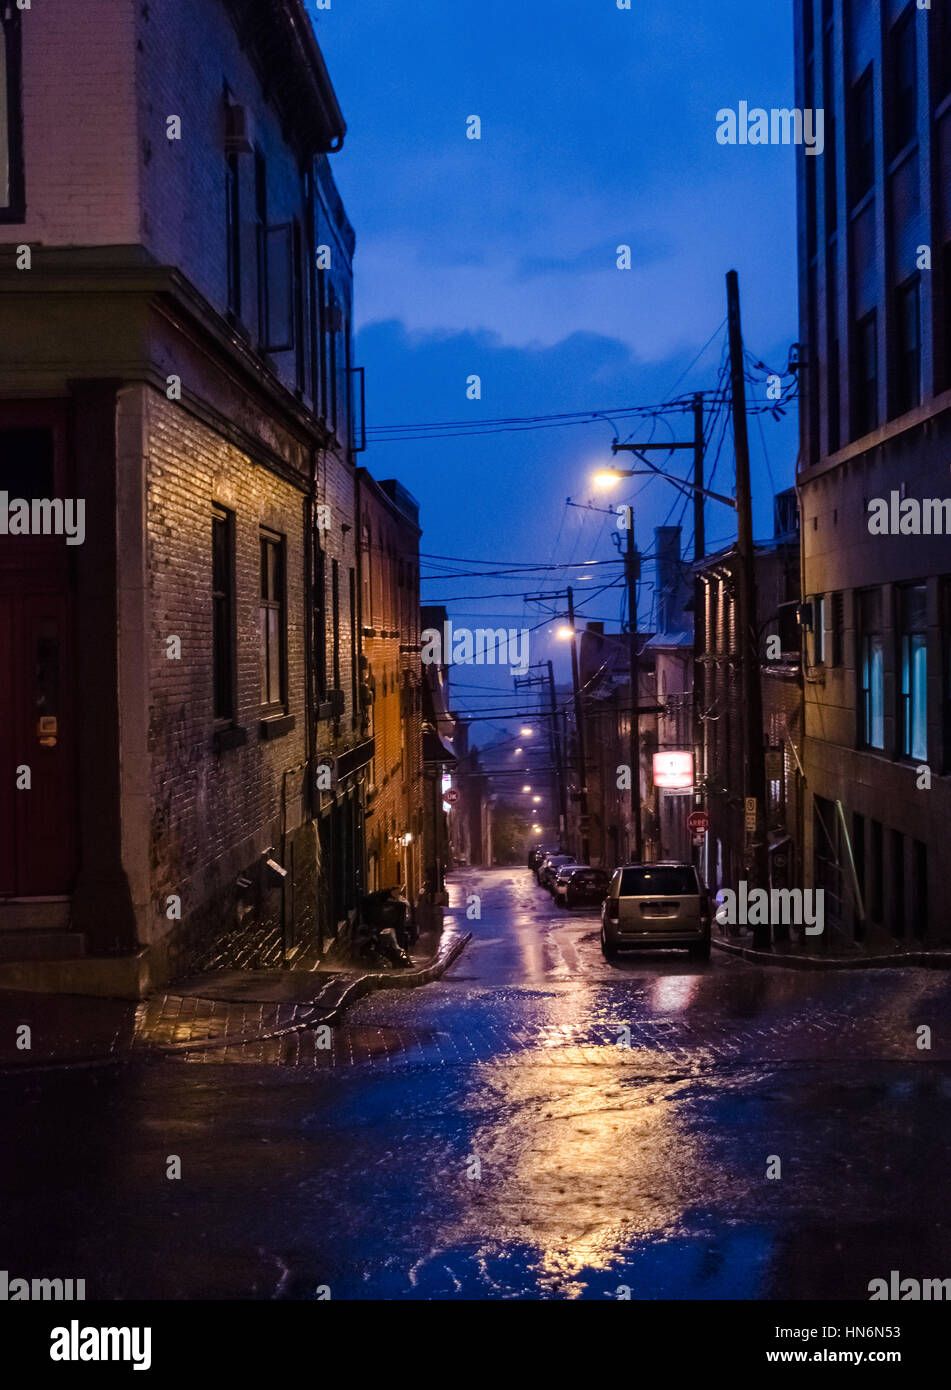 Dark Alley Photos Dark Alley Images Page 3 Alamy